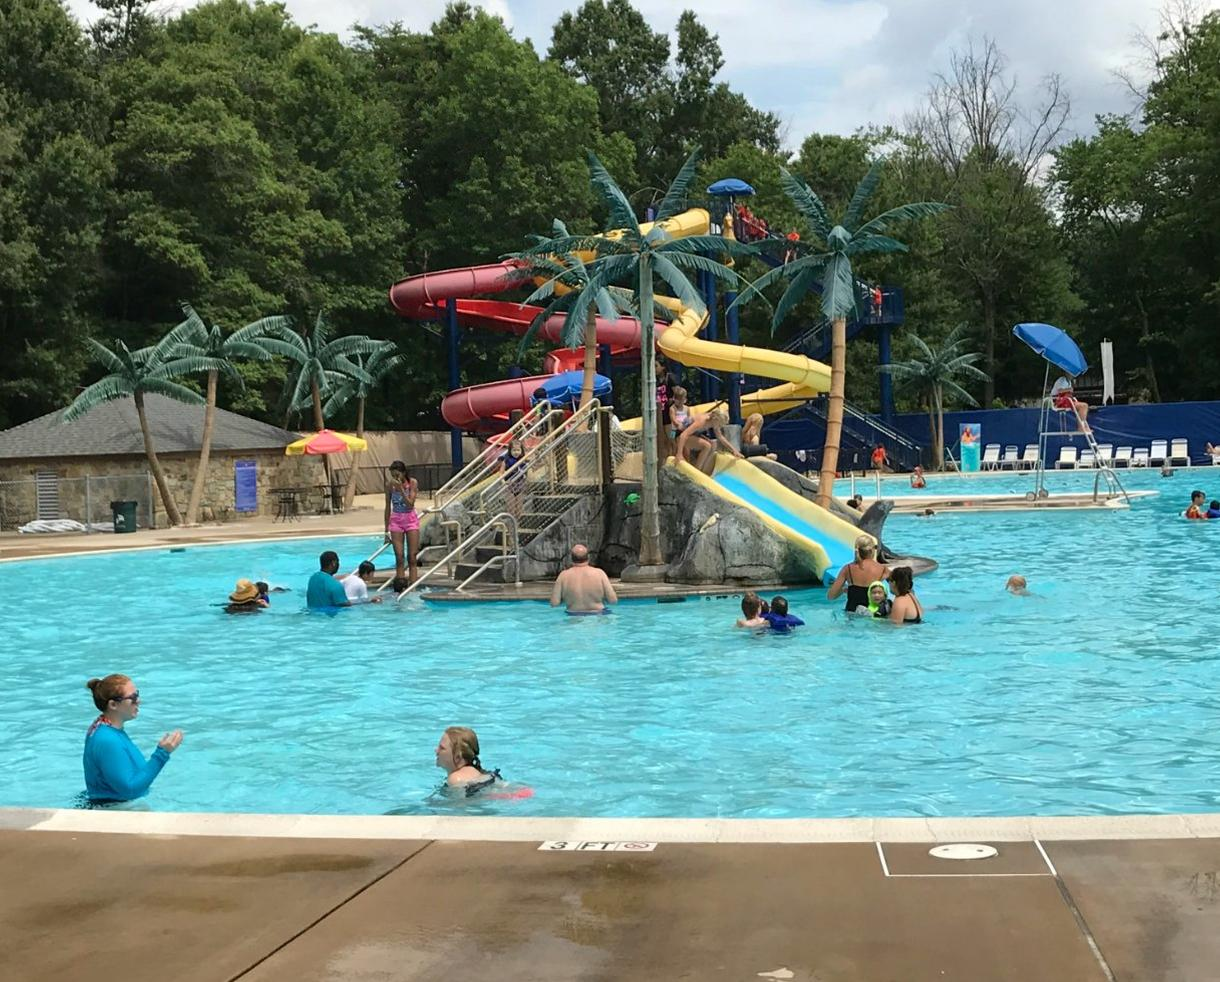 Atlantis Waterpark Admission